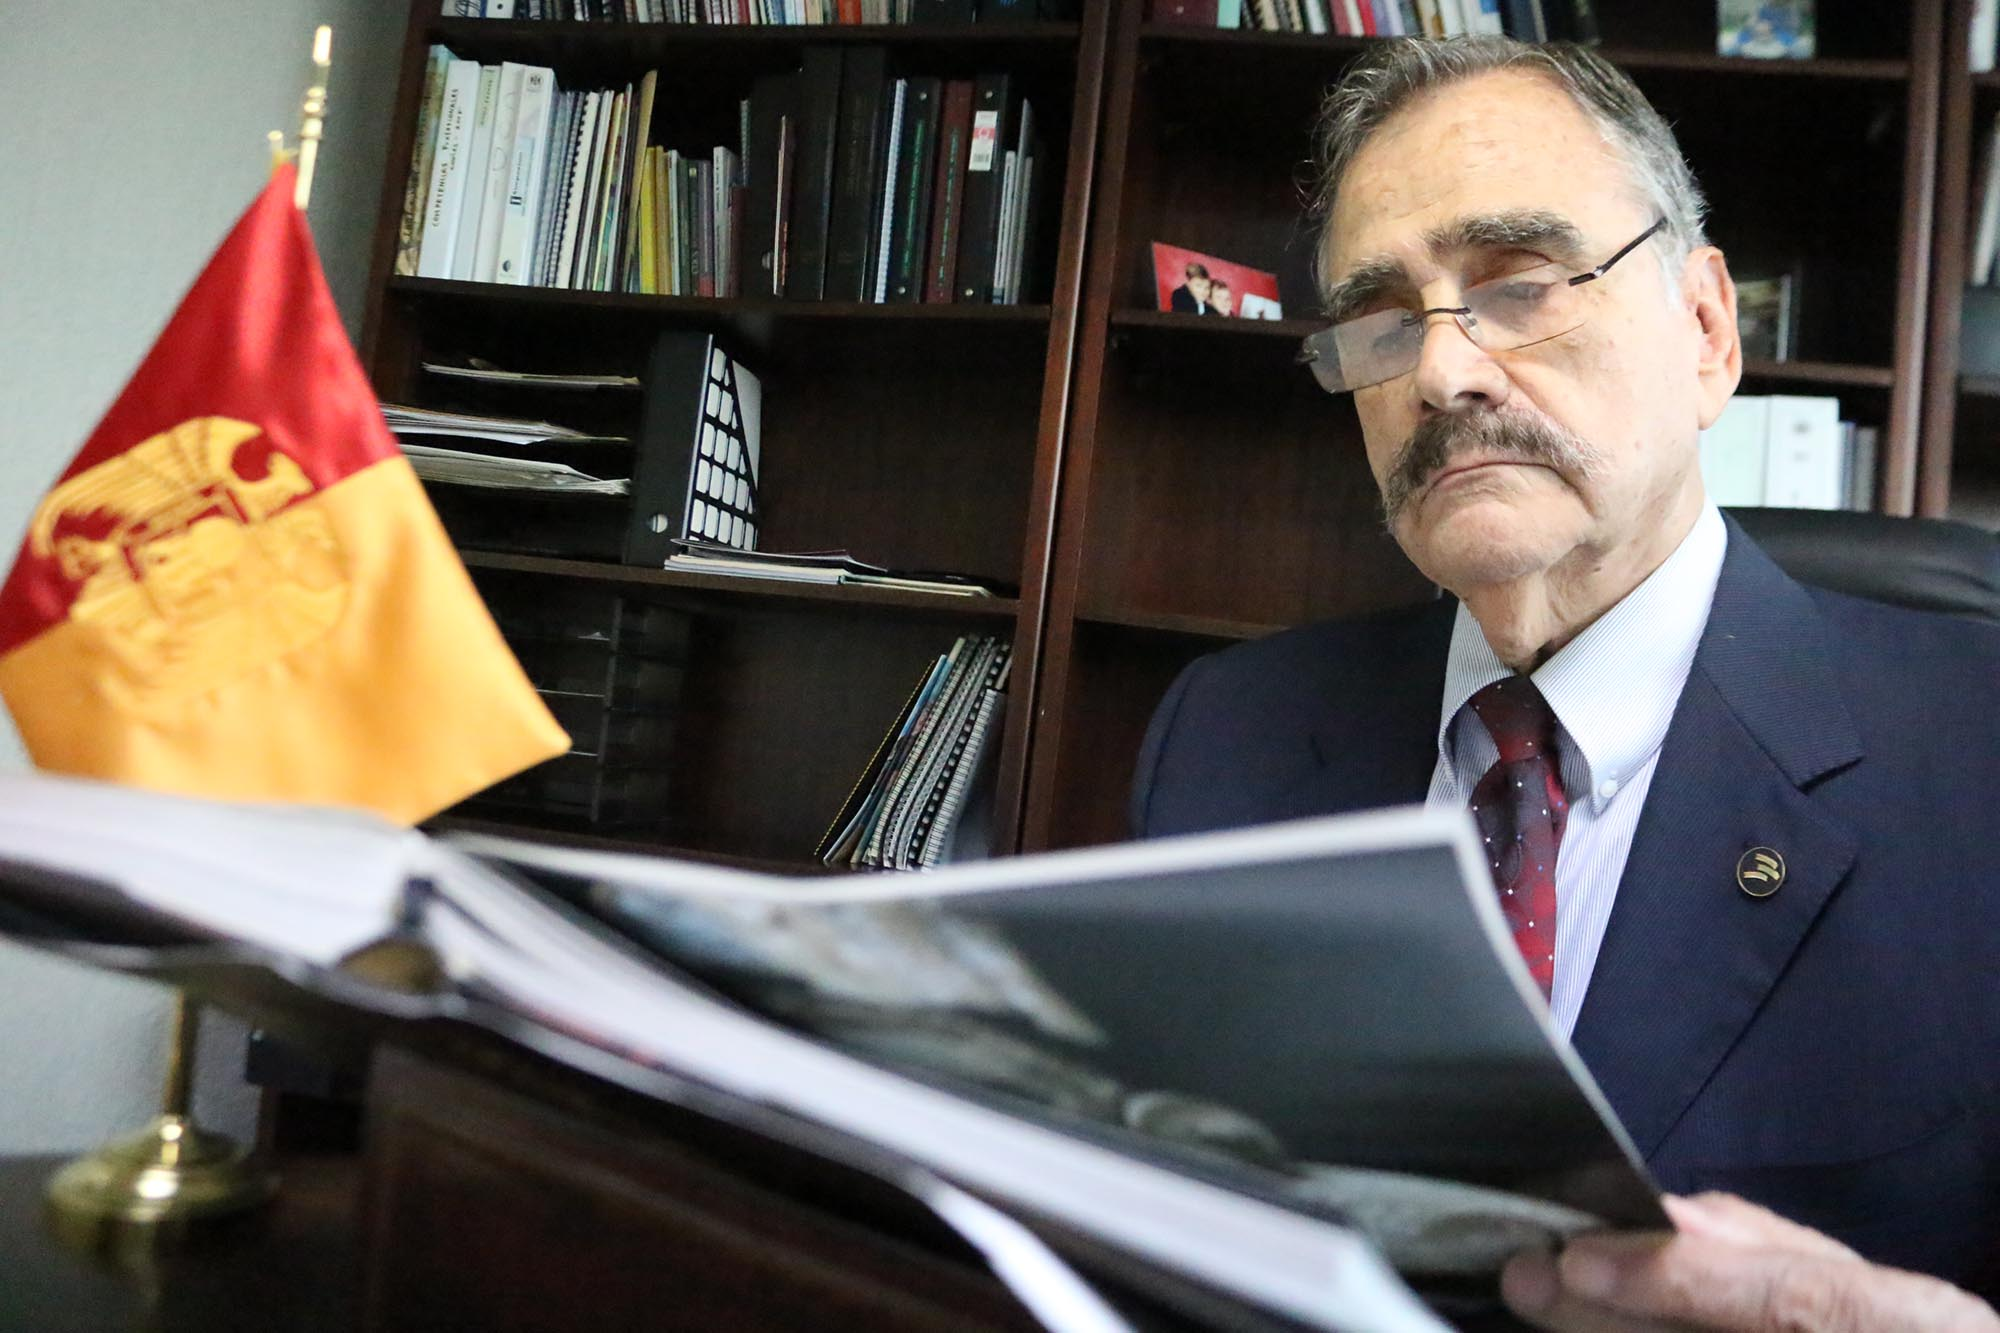 Dr. Néstor Velasco Pérez